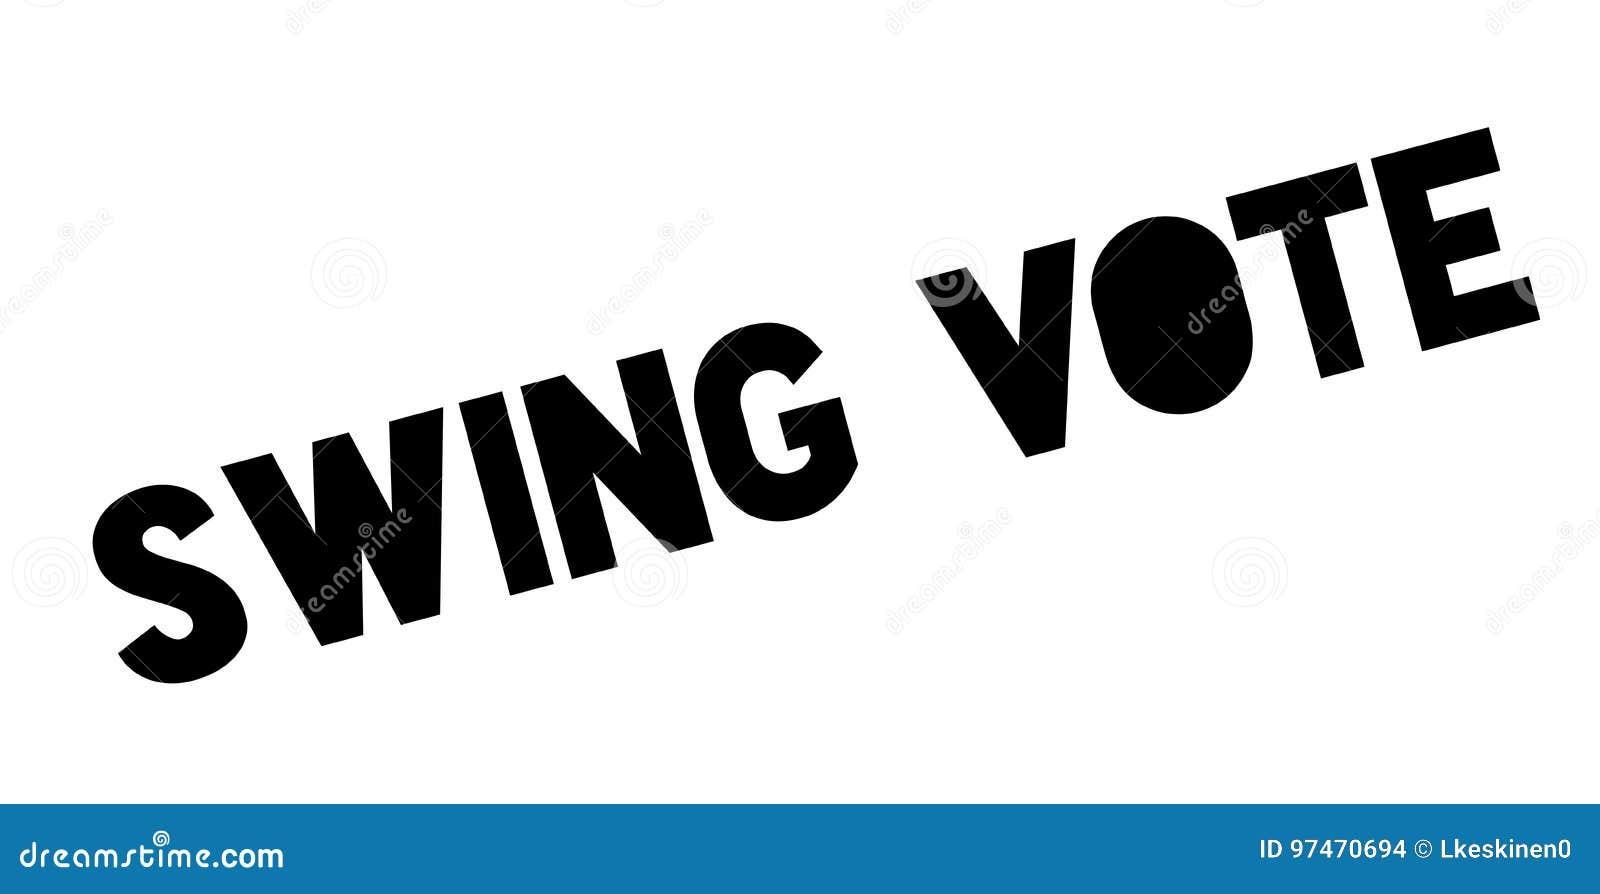 Swing vote download.